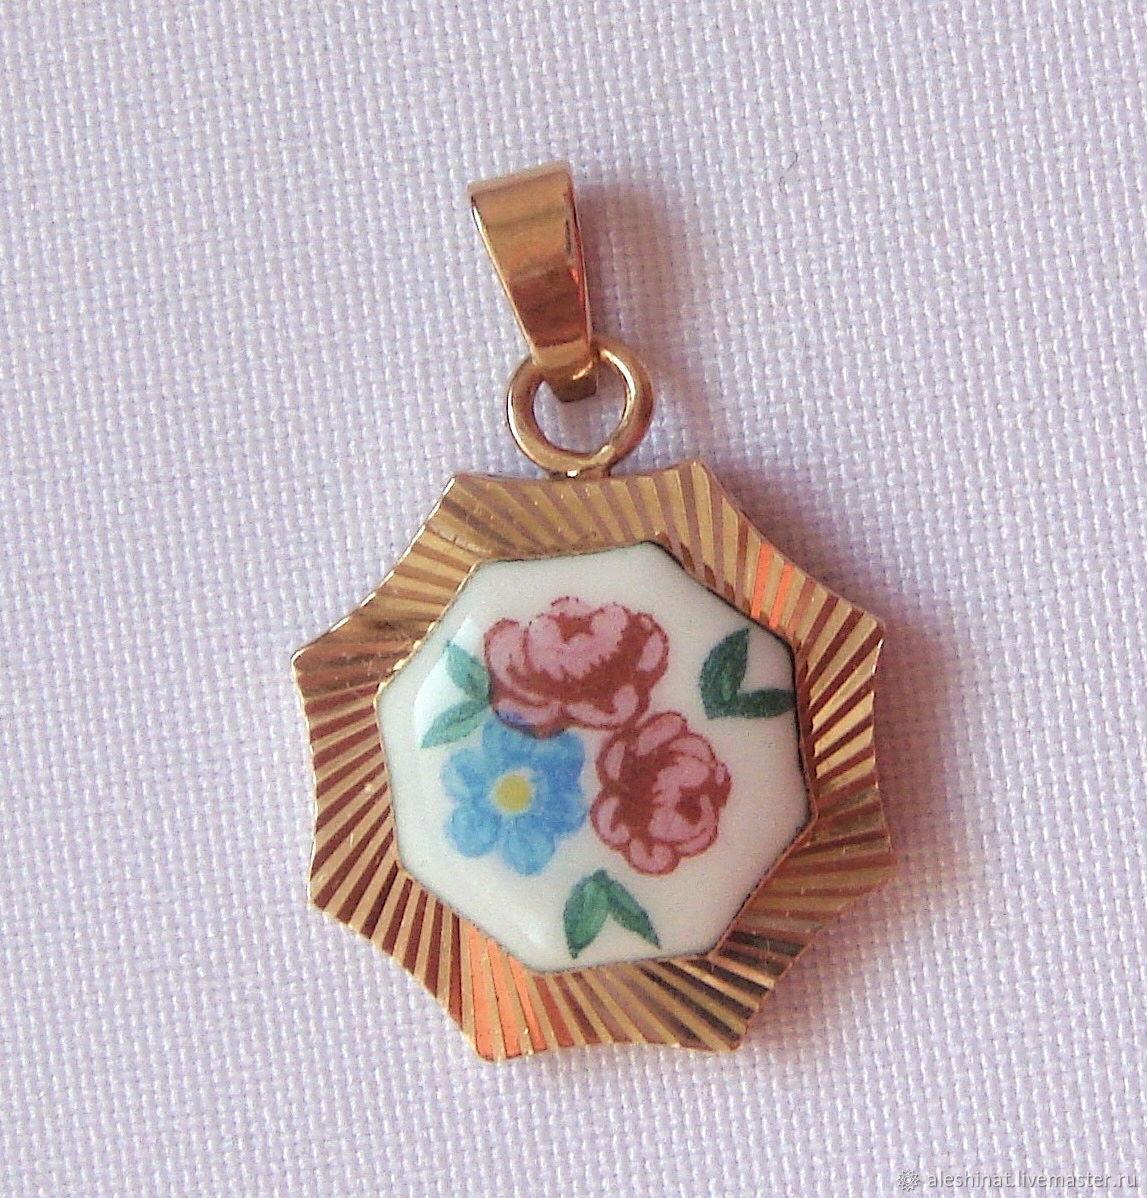 Gold Pendant Enamel Gold 583 weight of 4,01 grams, vintage USSR, Vintage pendants, Saratov,  Фото №1